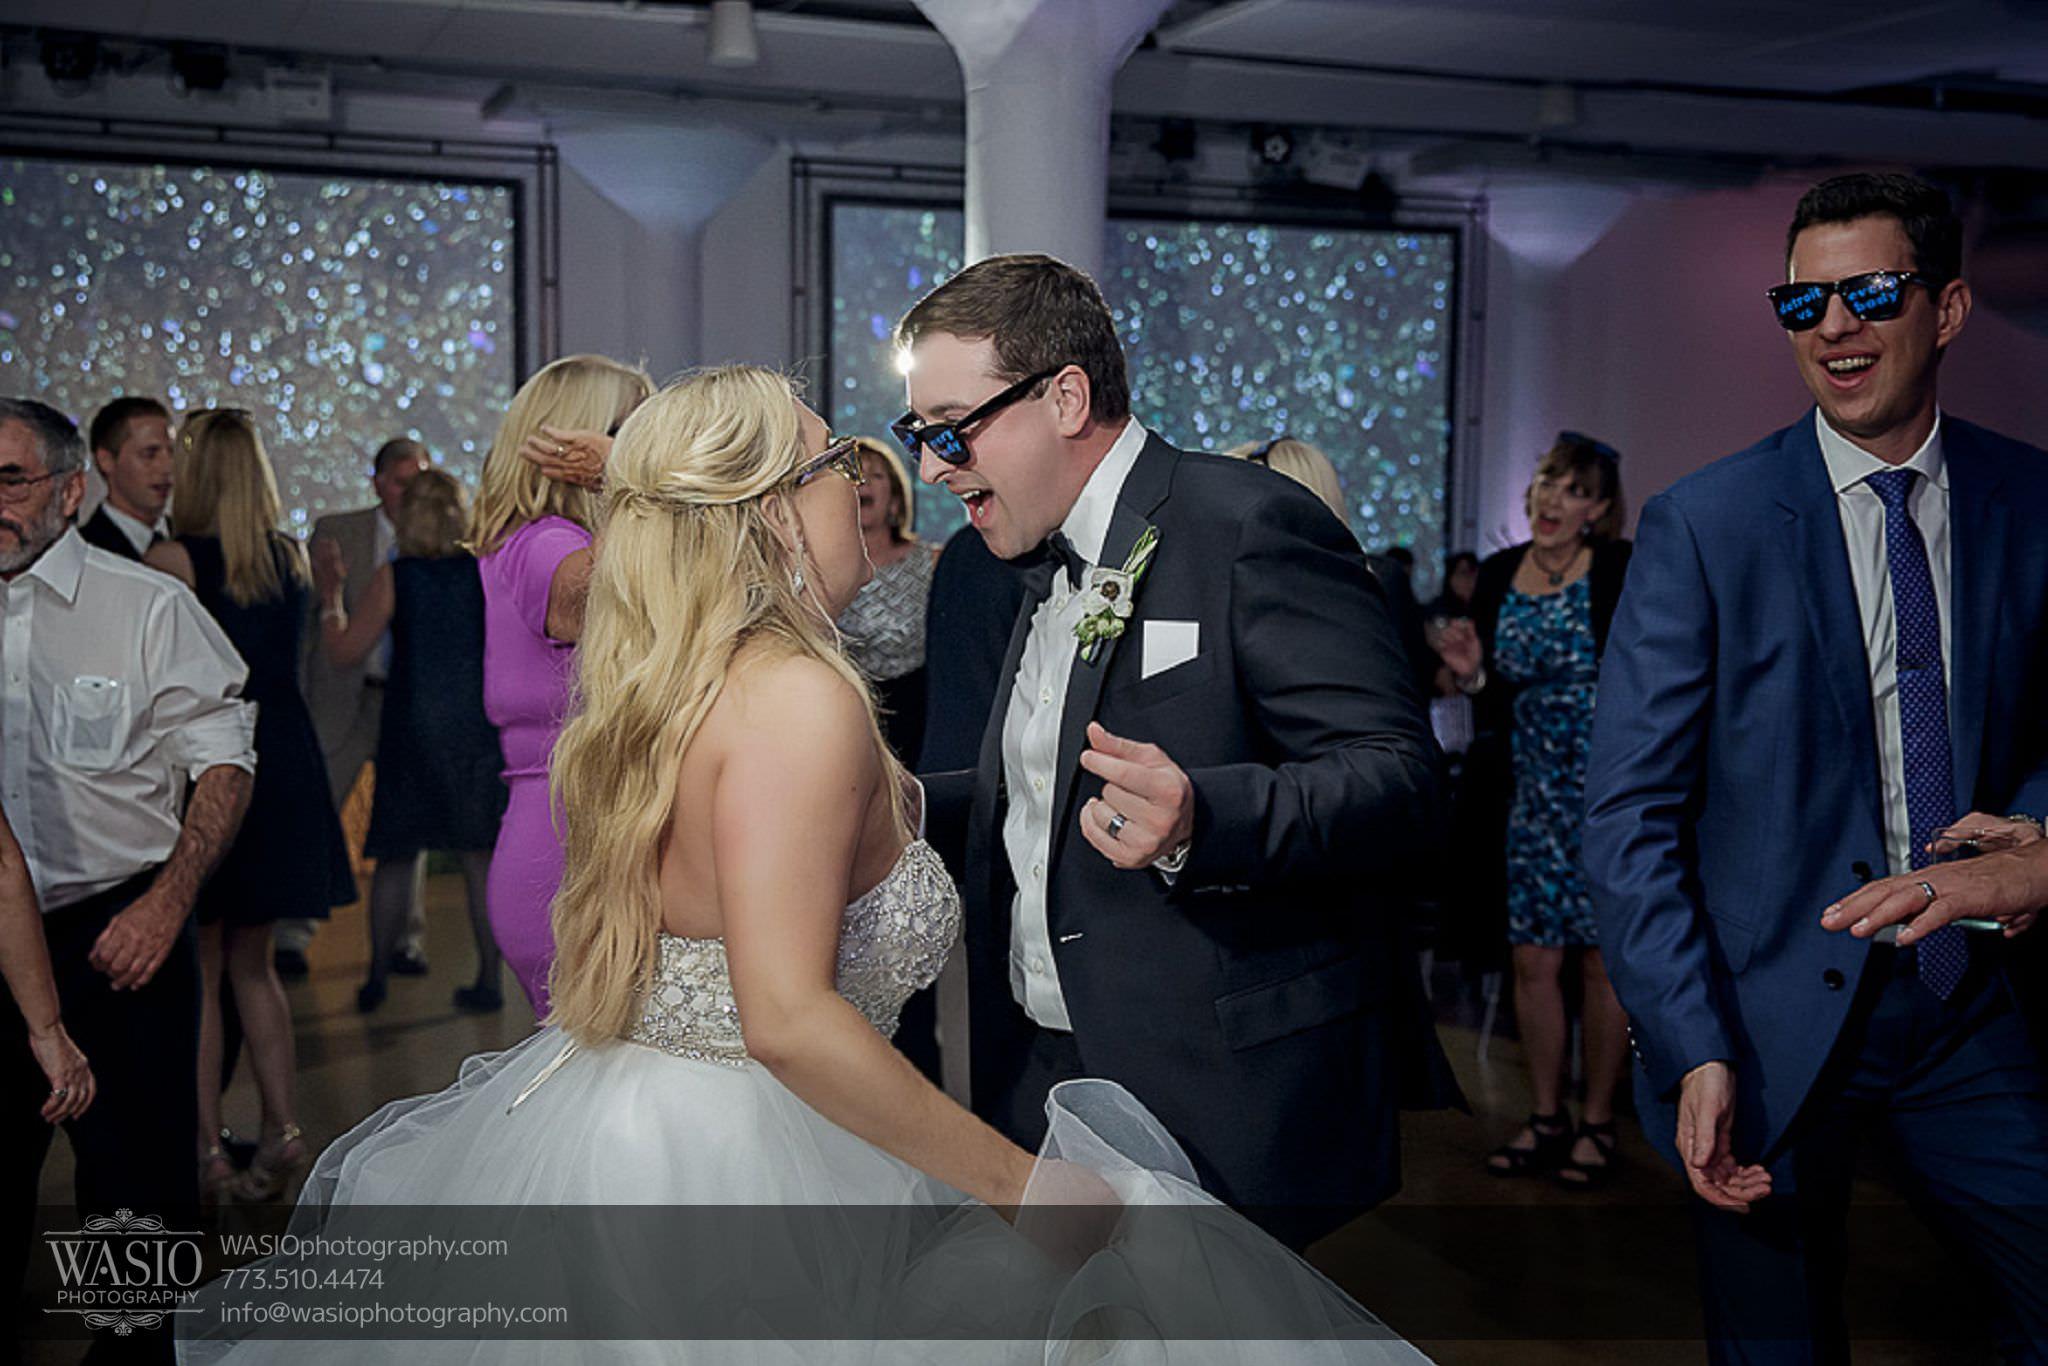 venue-one-chicago-wedding-custom-sun-glasses-dance-floor-73 Venue One Chicago Wedding - Katie + Mike